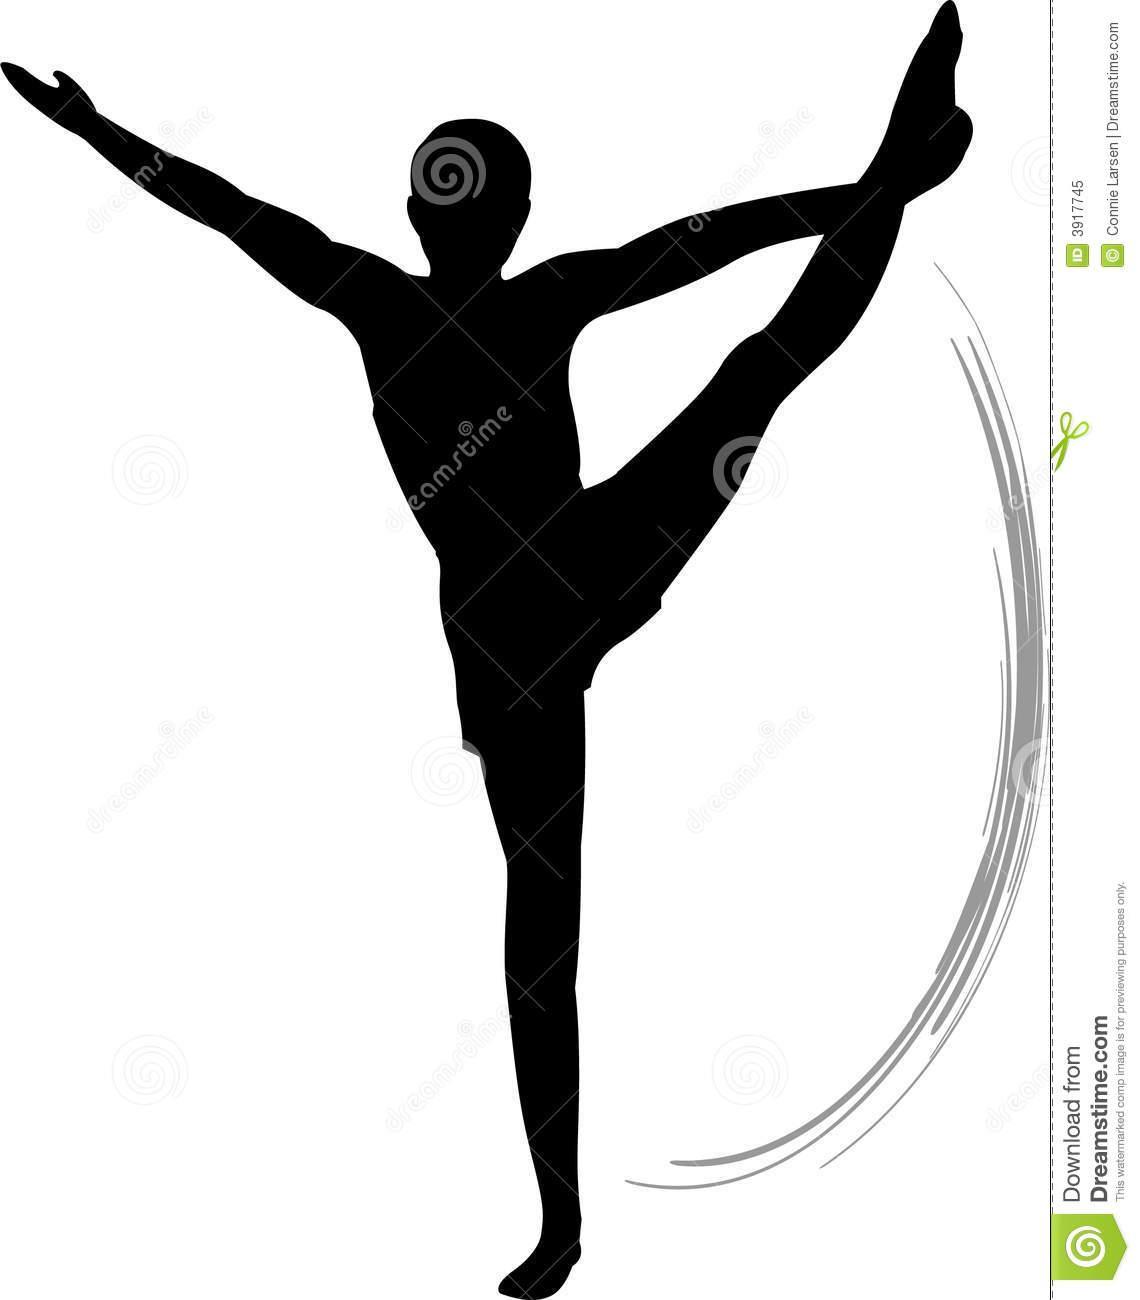 1140x1300 Exercise Gymnastics Clipart